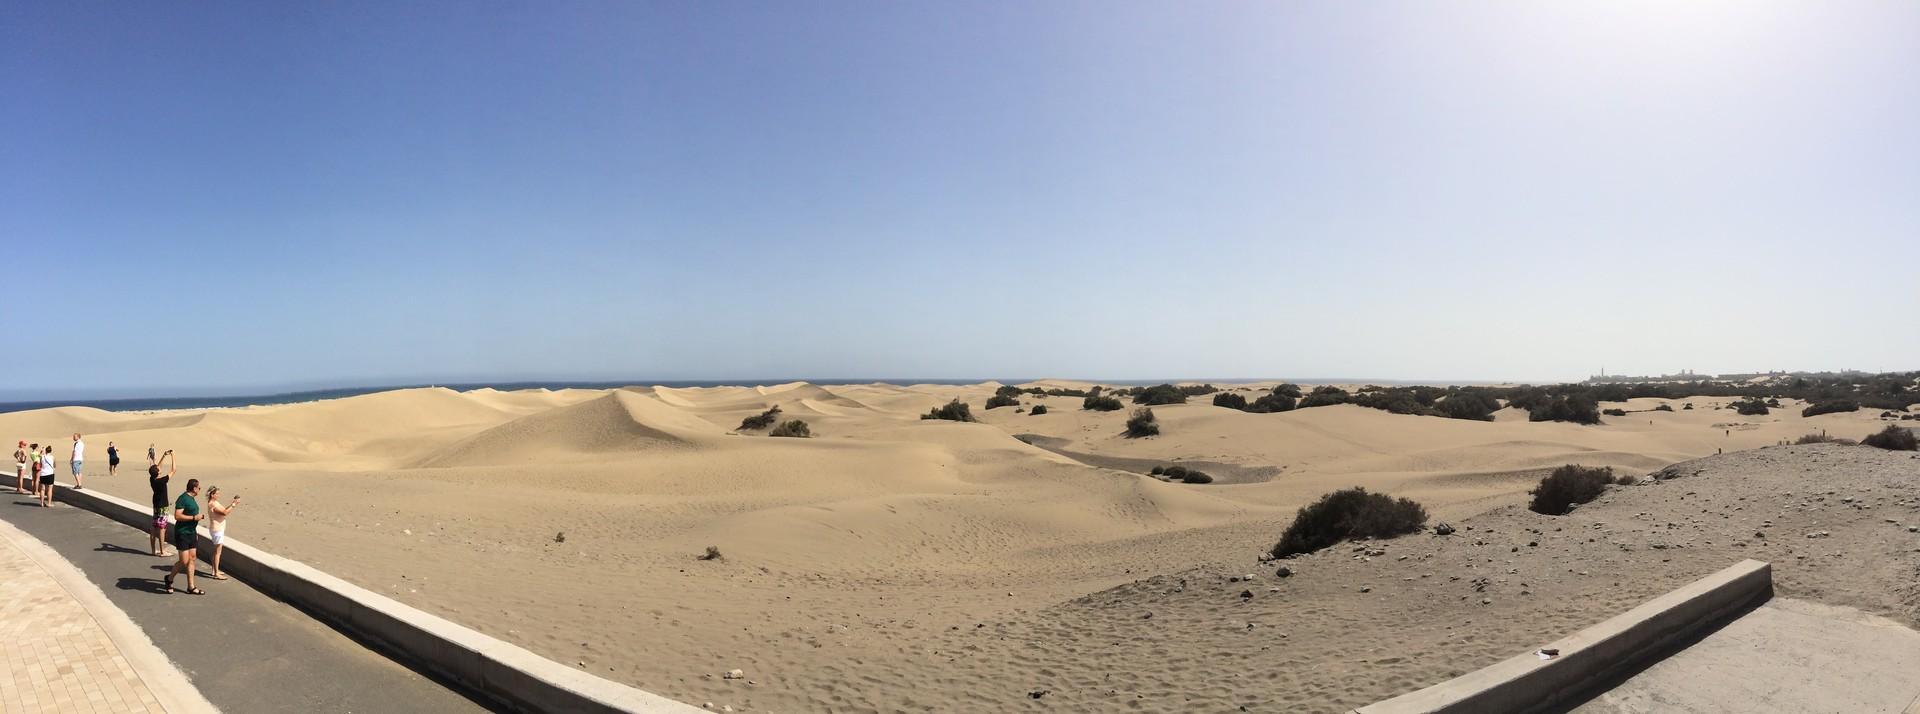 playas-sur-isla-gran-canaria-74d63b52127